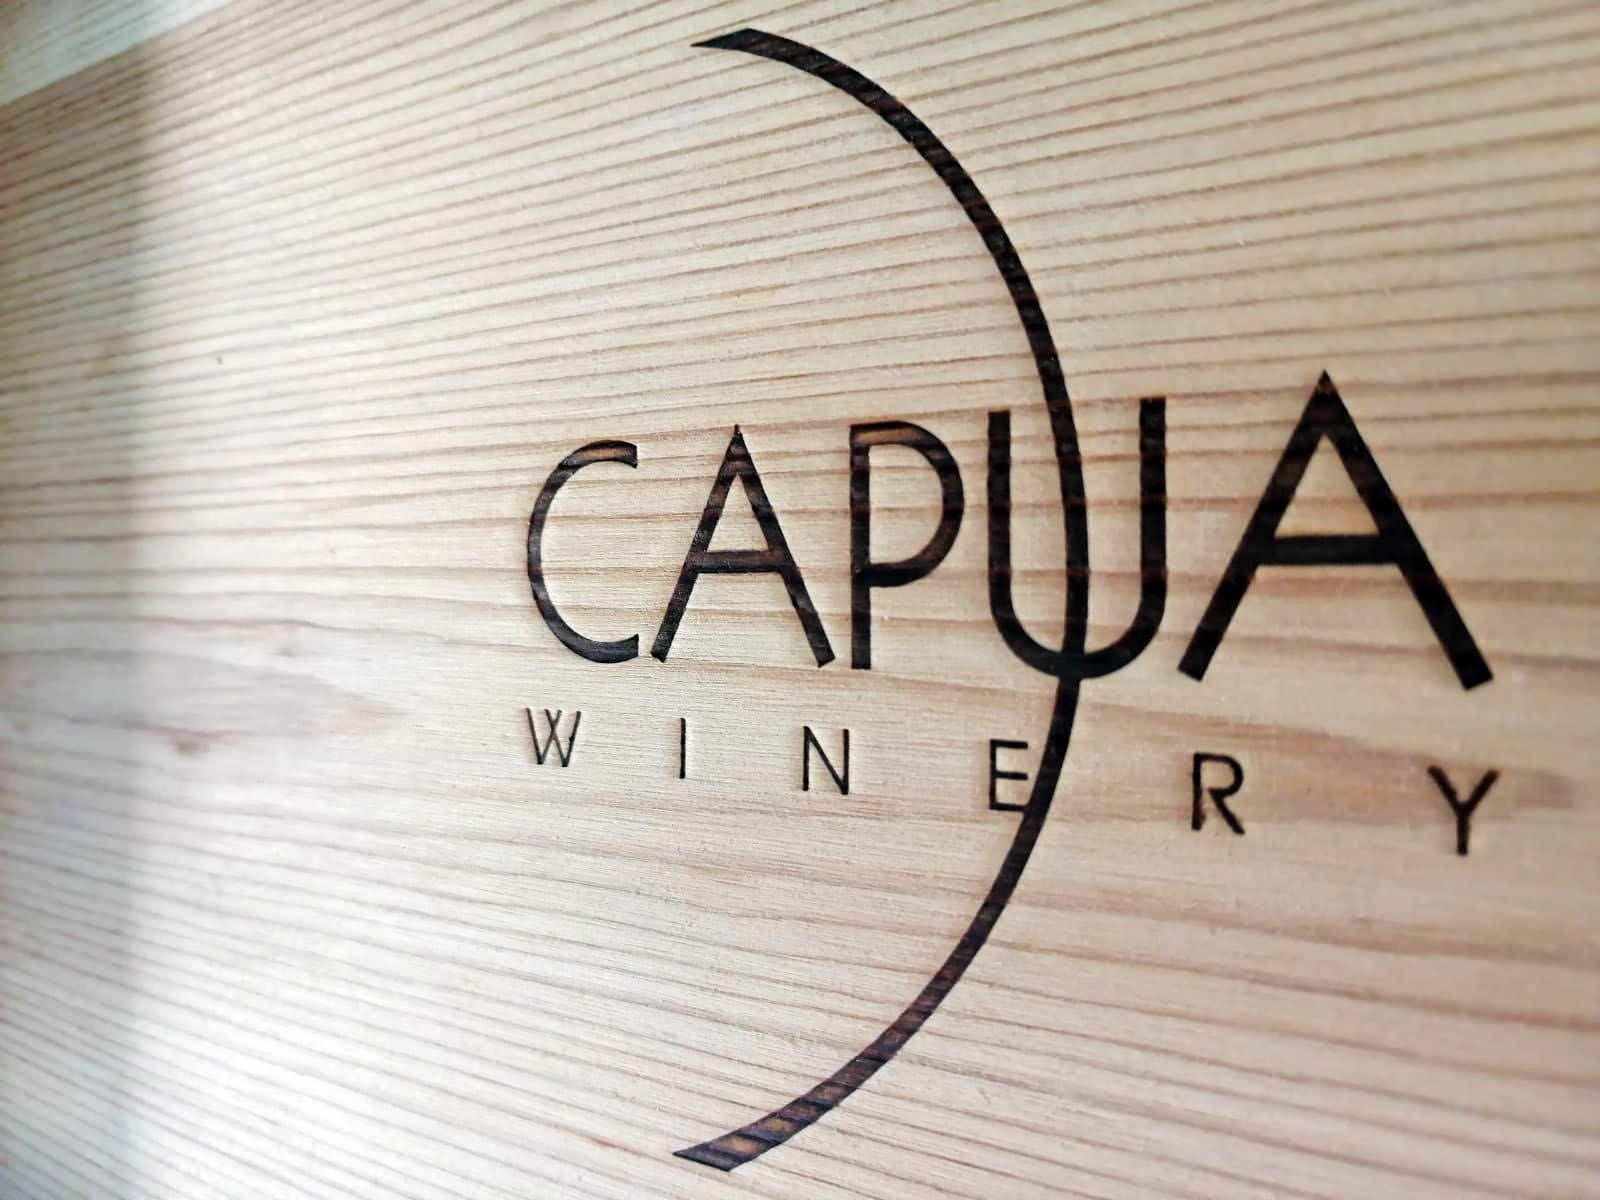 capua winery